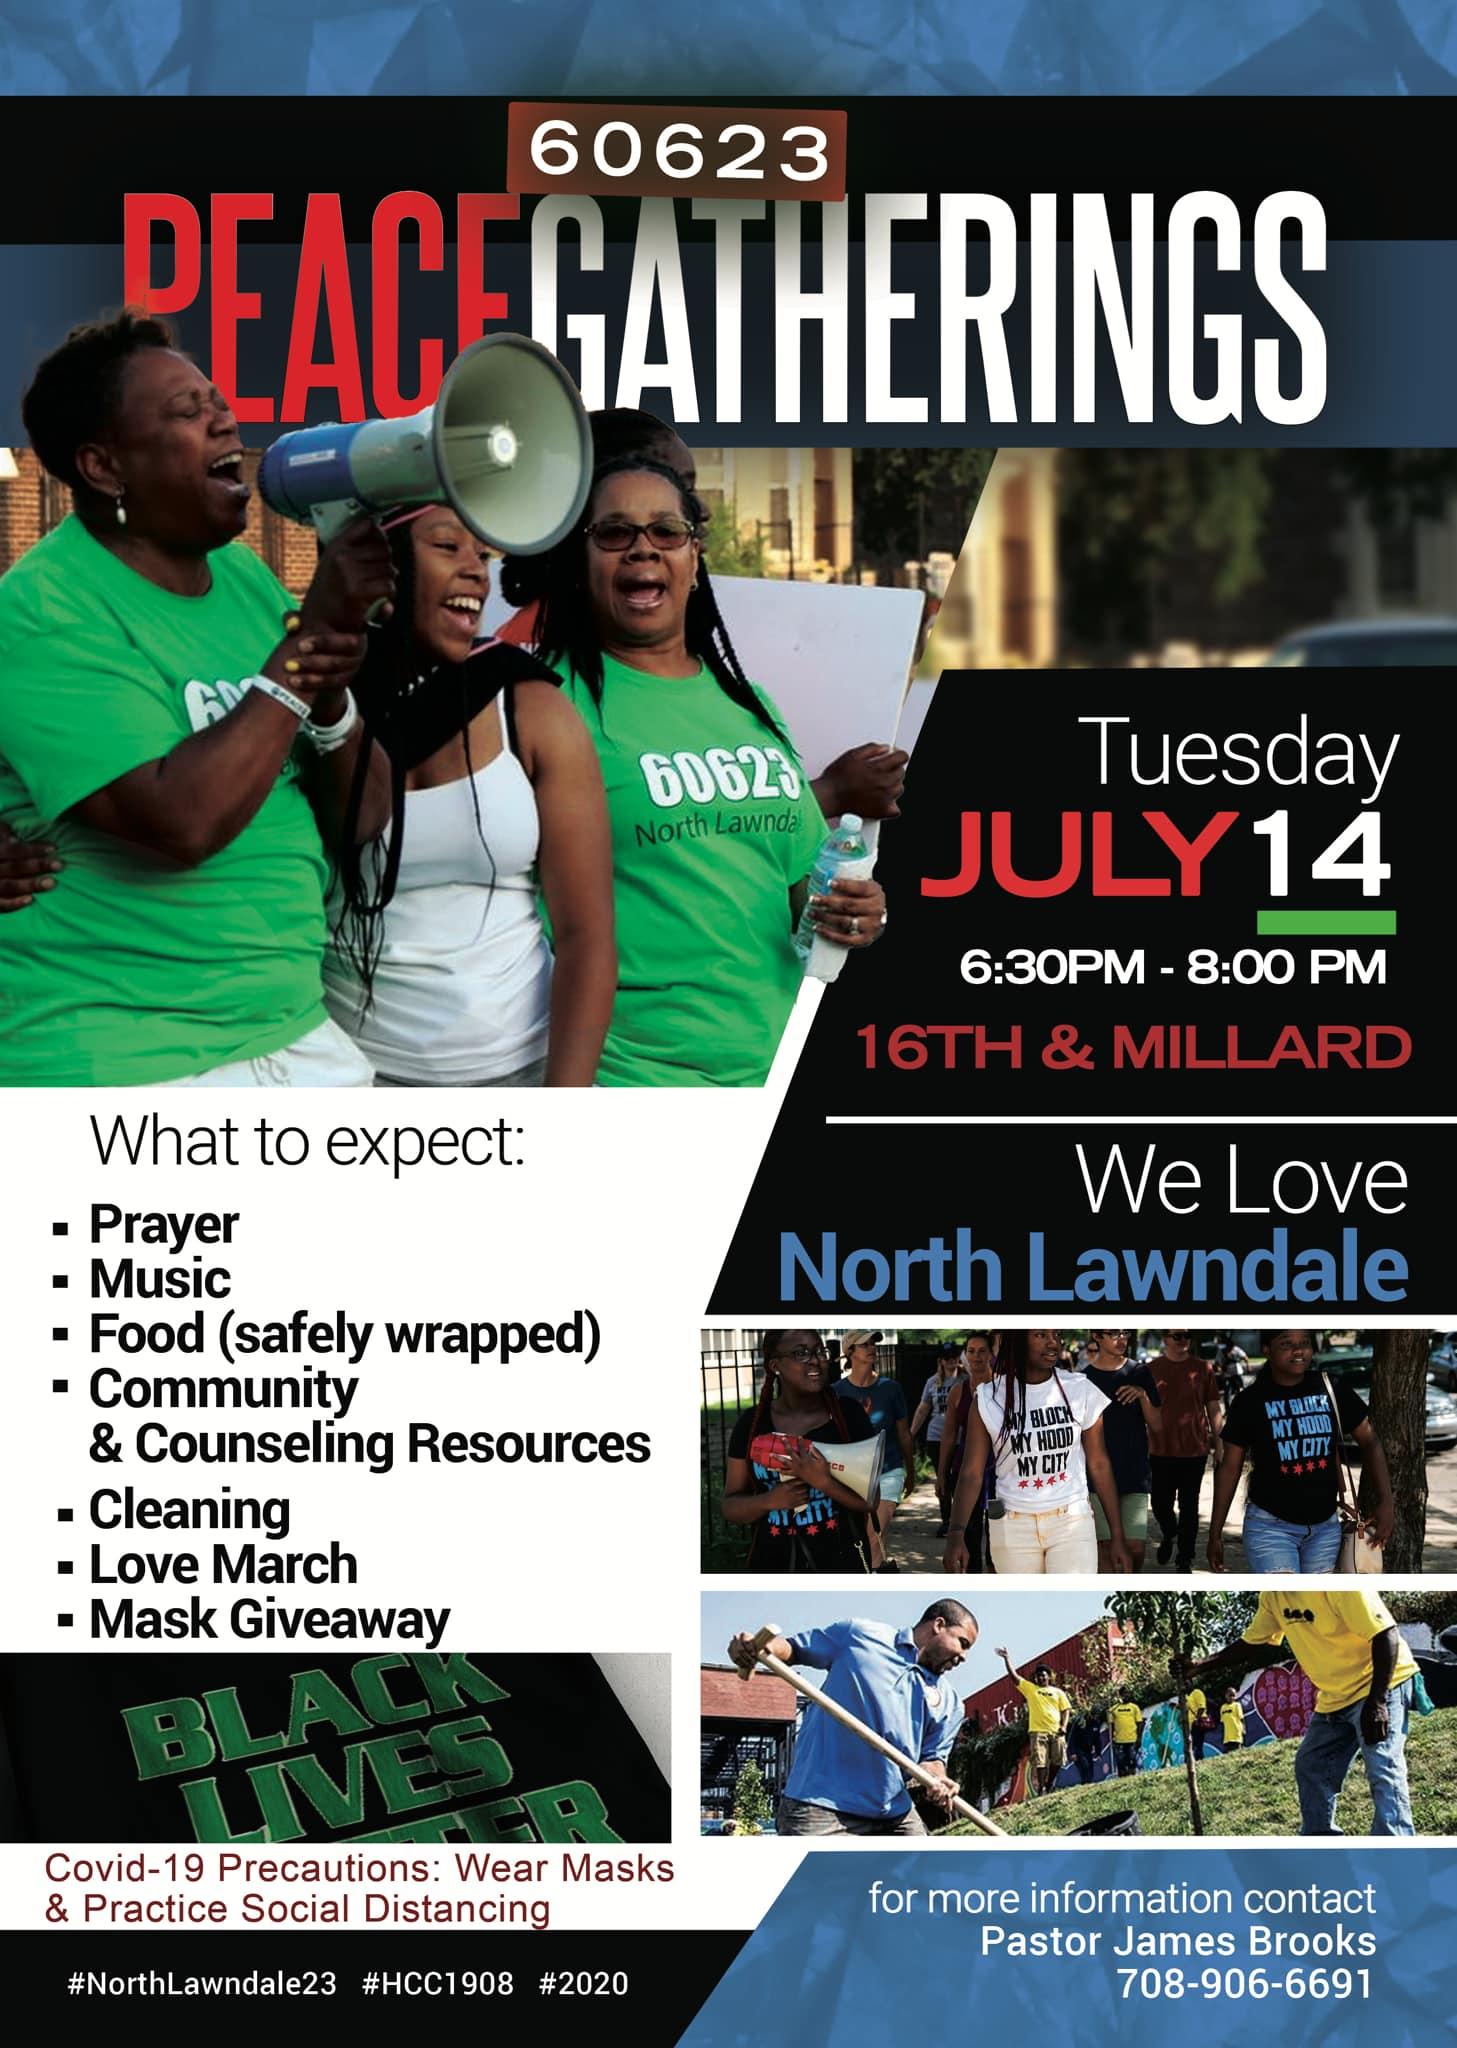 60623 Peace Gatherings